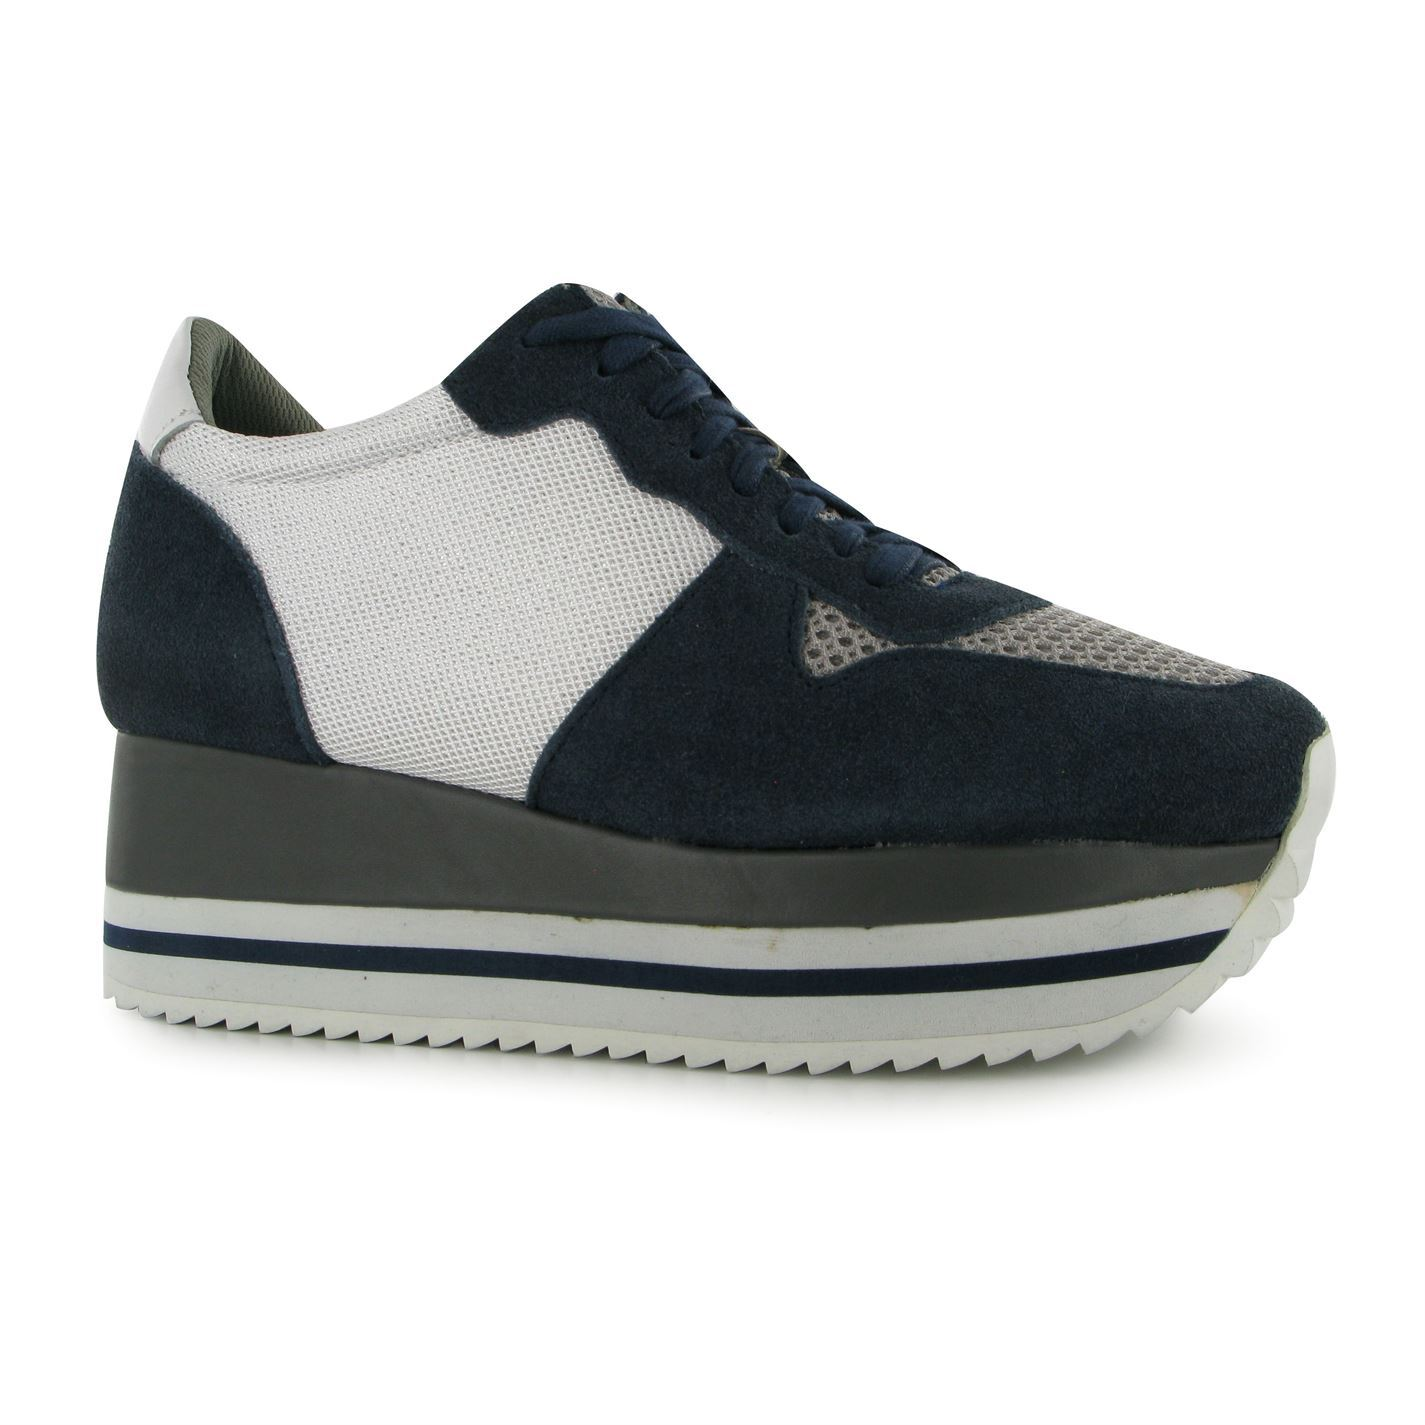 Trainers shoes traduzione